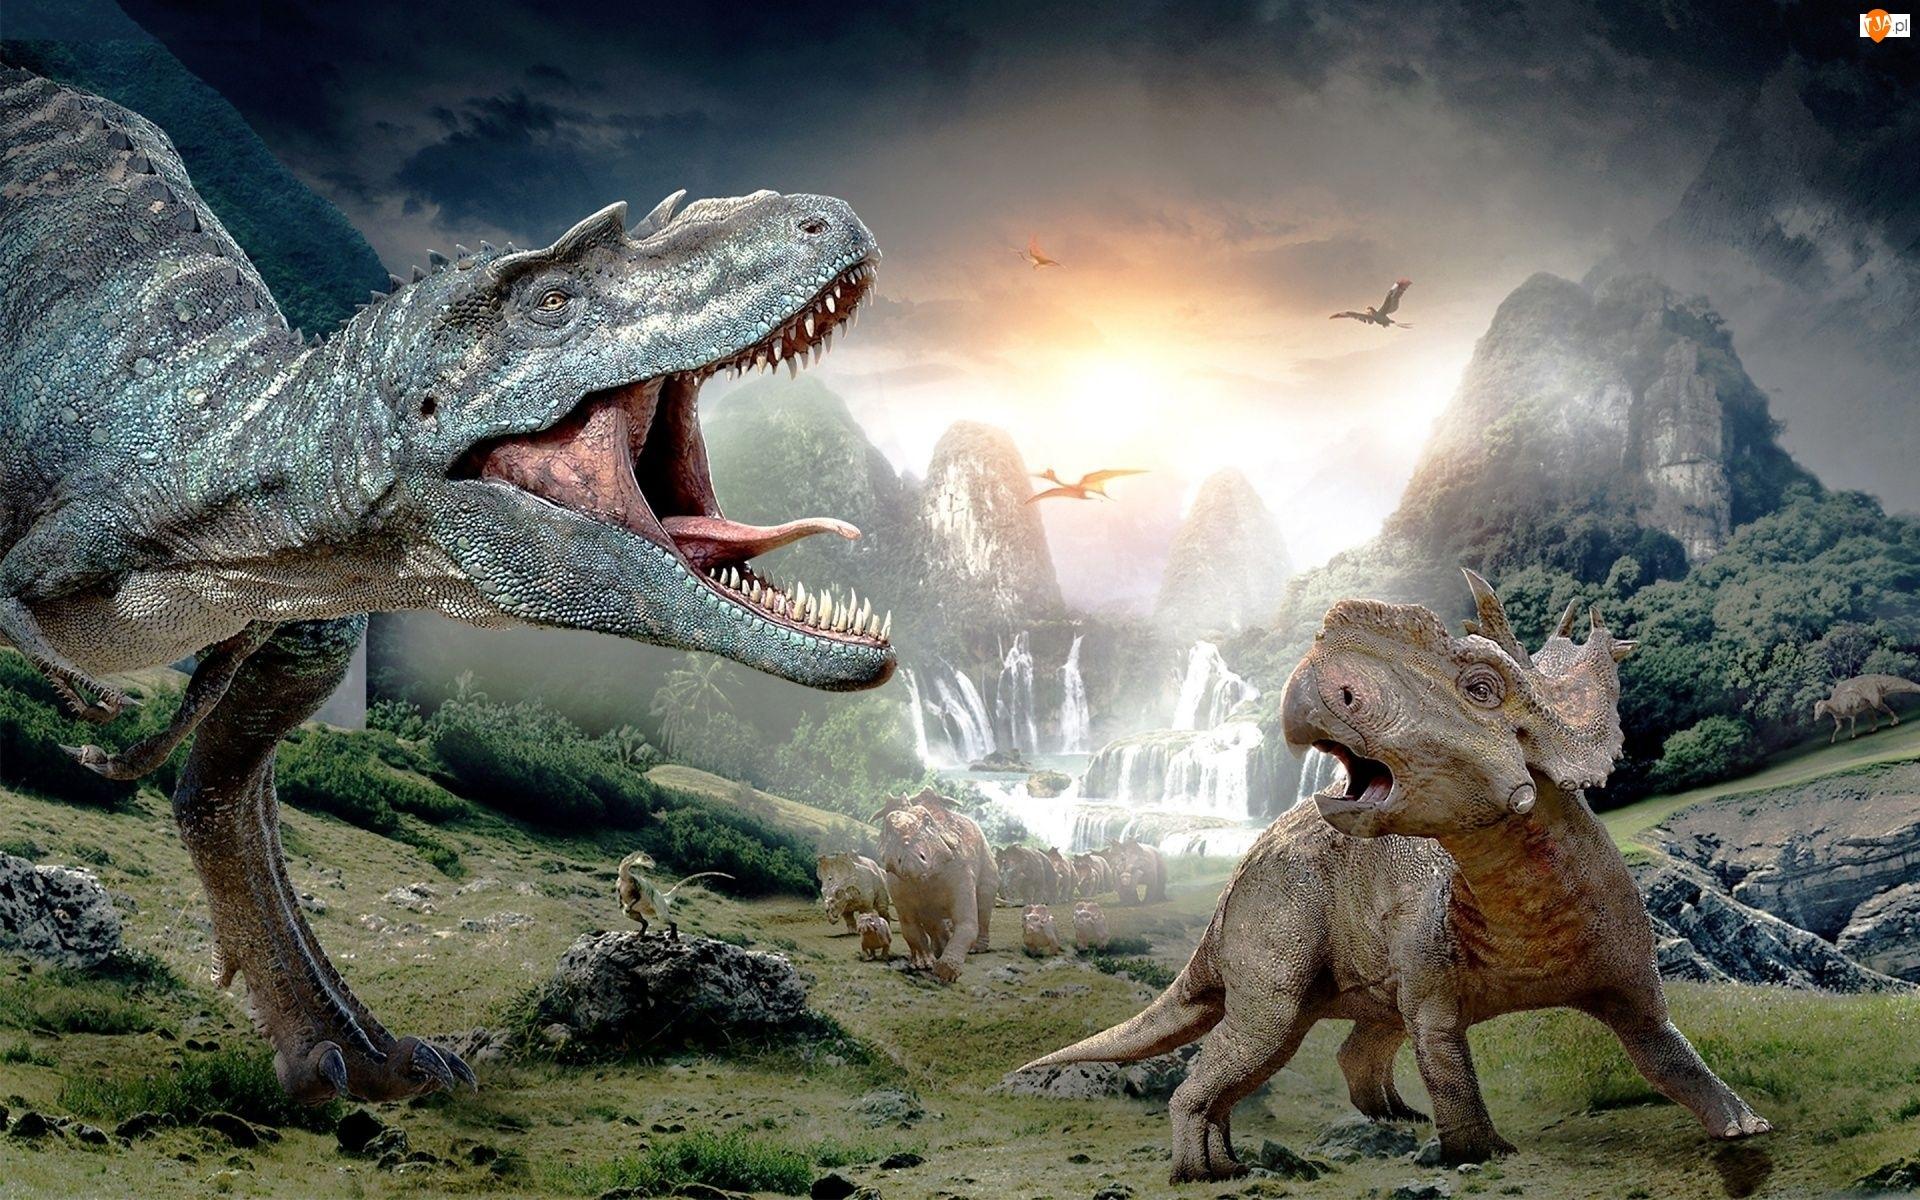 Lasy, Dinozaury, Góry